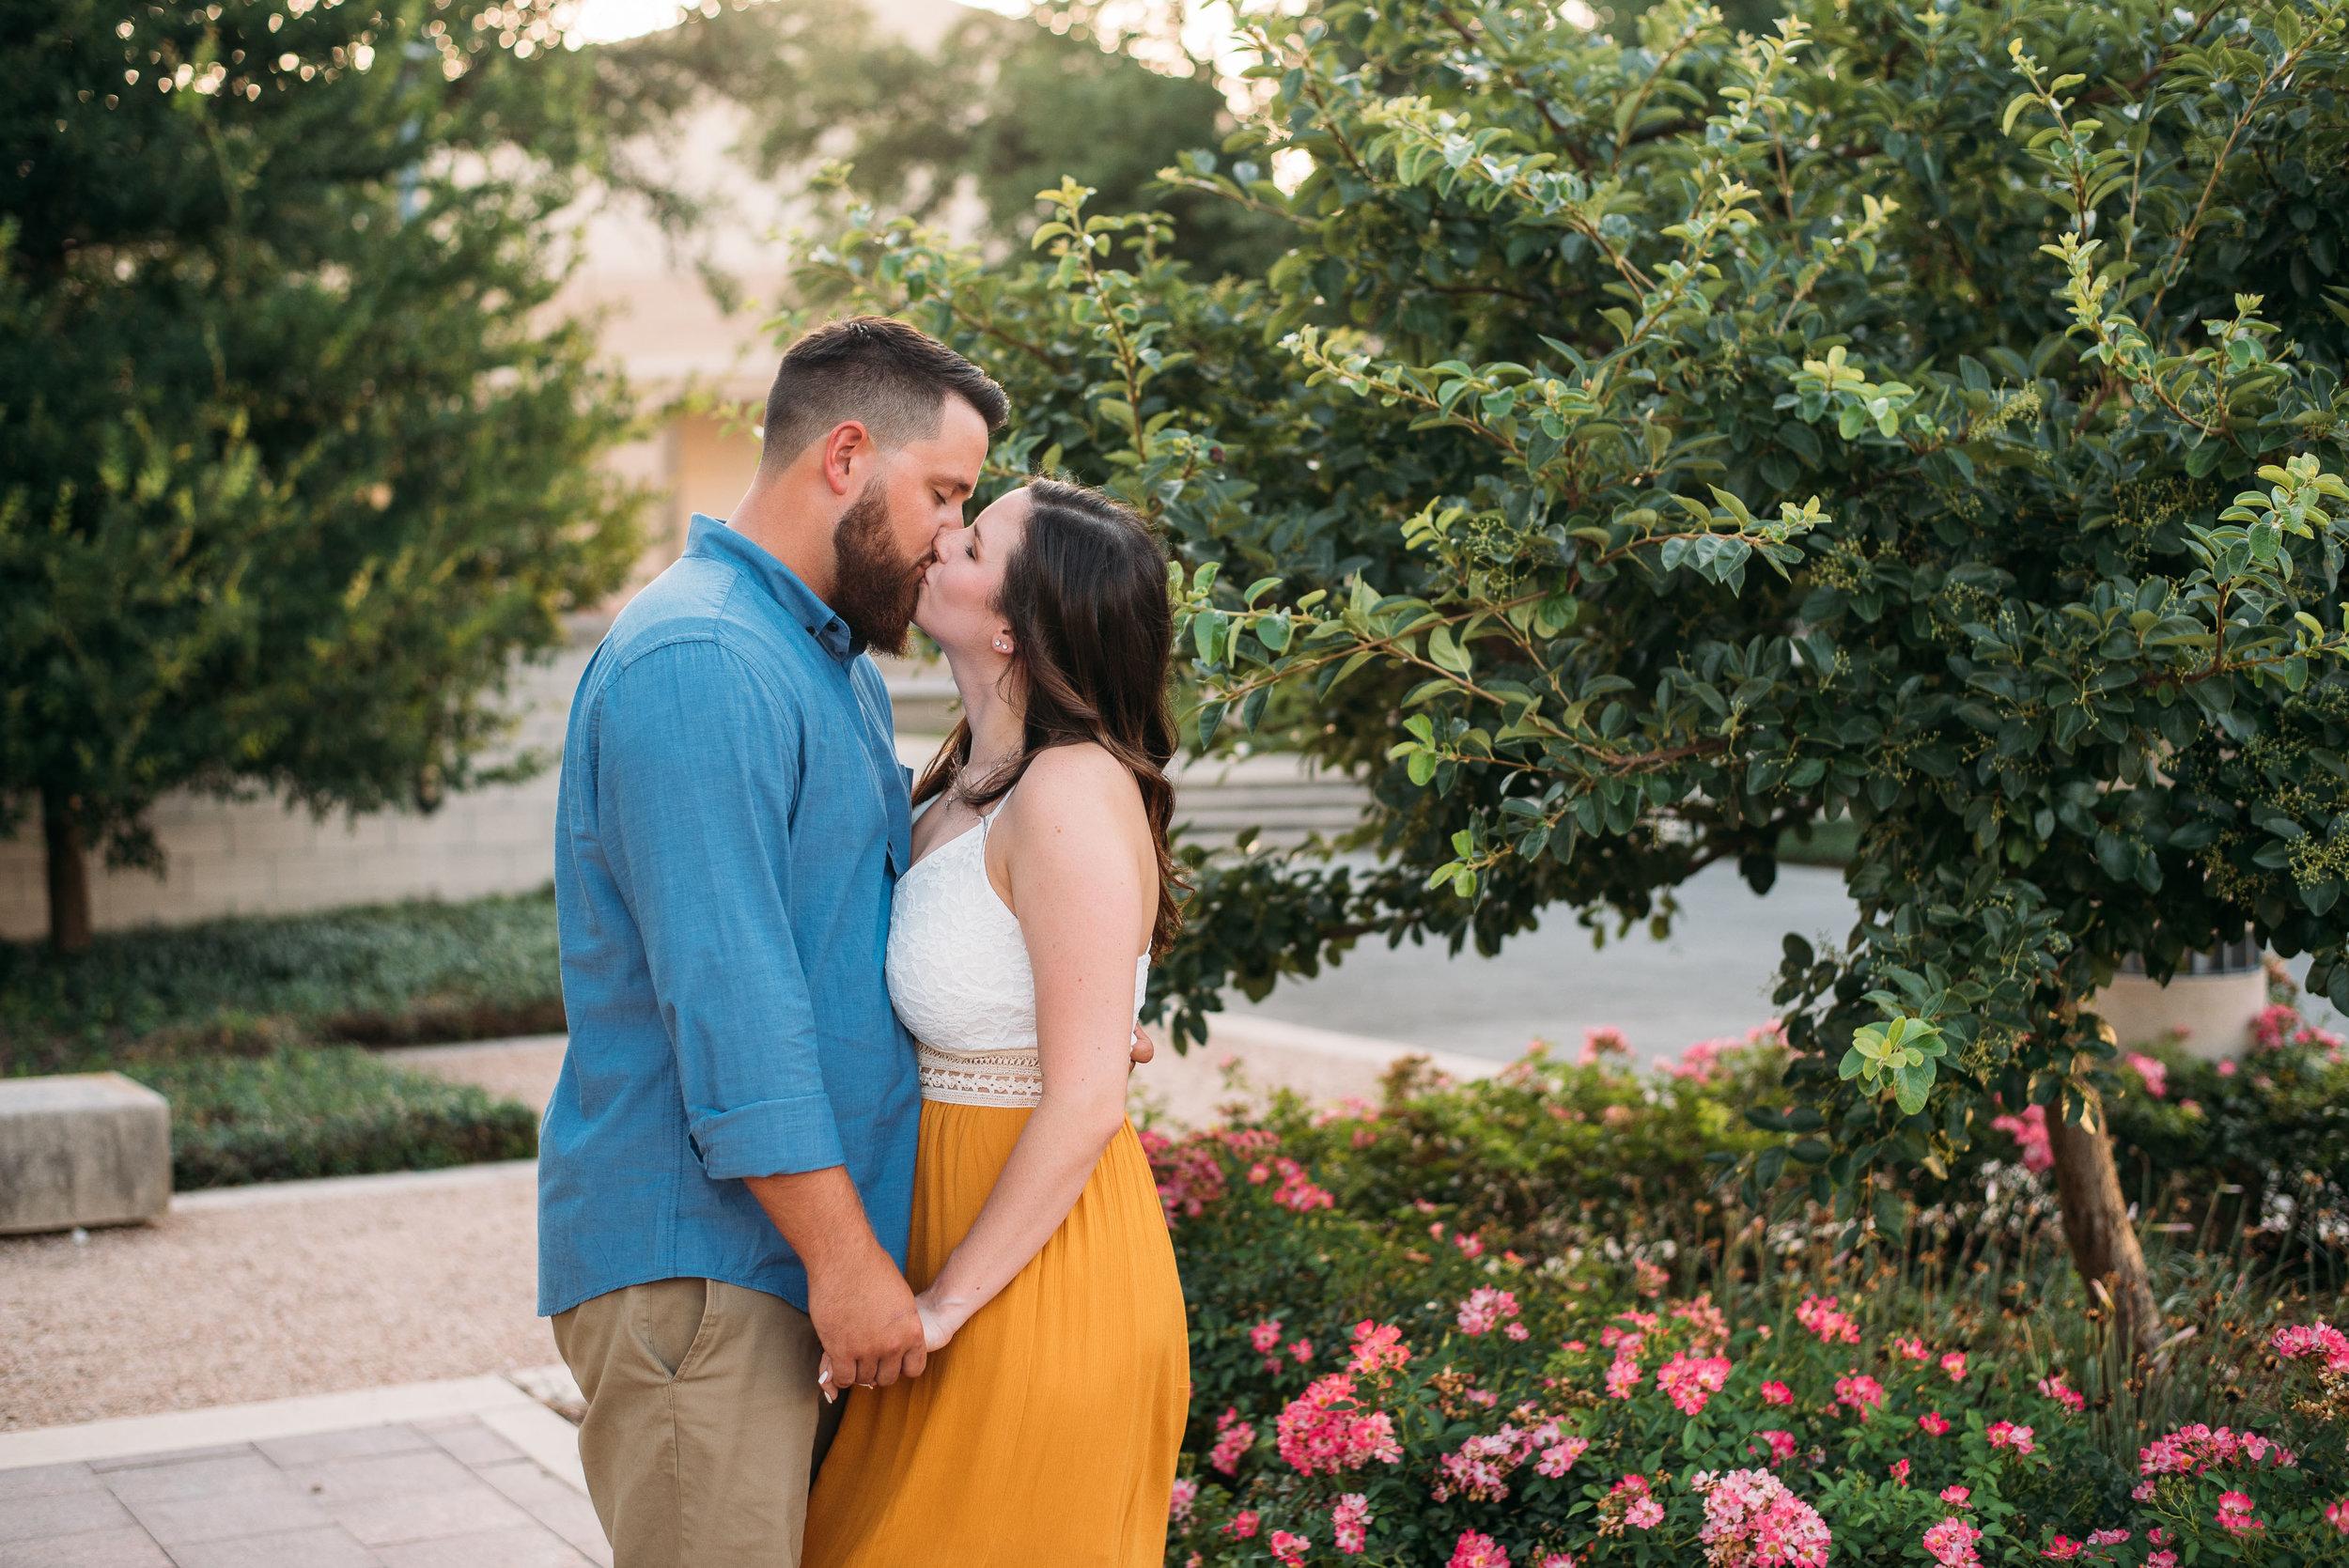 George-Bush-Library-Texas-A&M-University-Engagement-College-Station-Wedding-Photographer-San-Angel-Photo-Mark-Jenna-Matt-Century-Tree-03.jpg